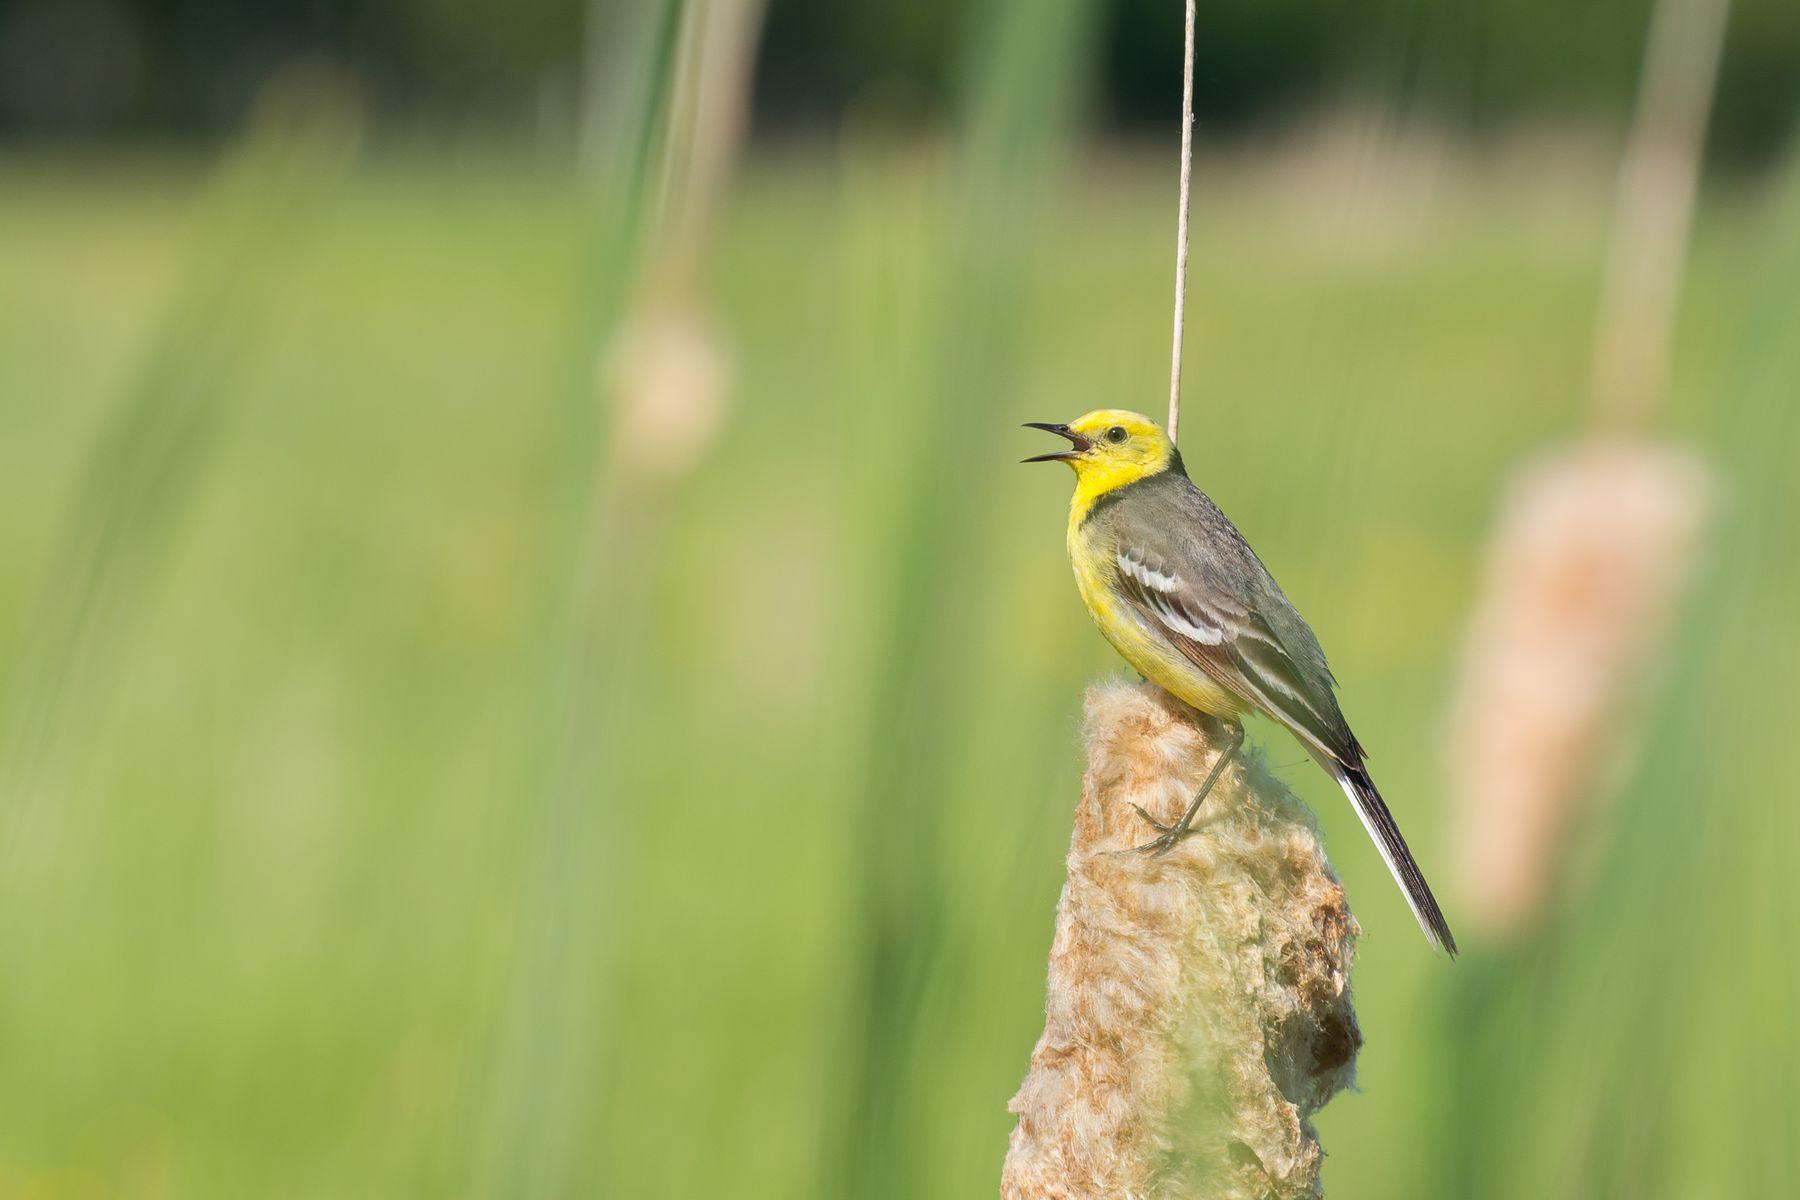 Малая желтоголовая трясогузка Трясогузка птица фотоохота Сибирь